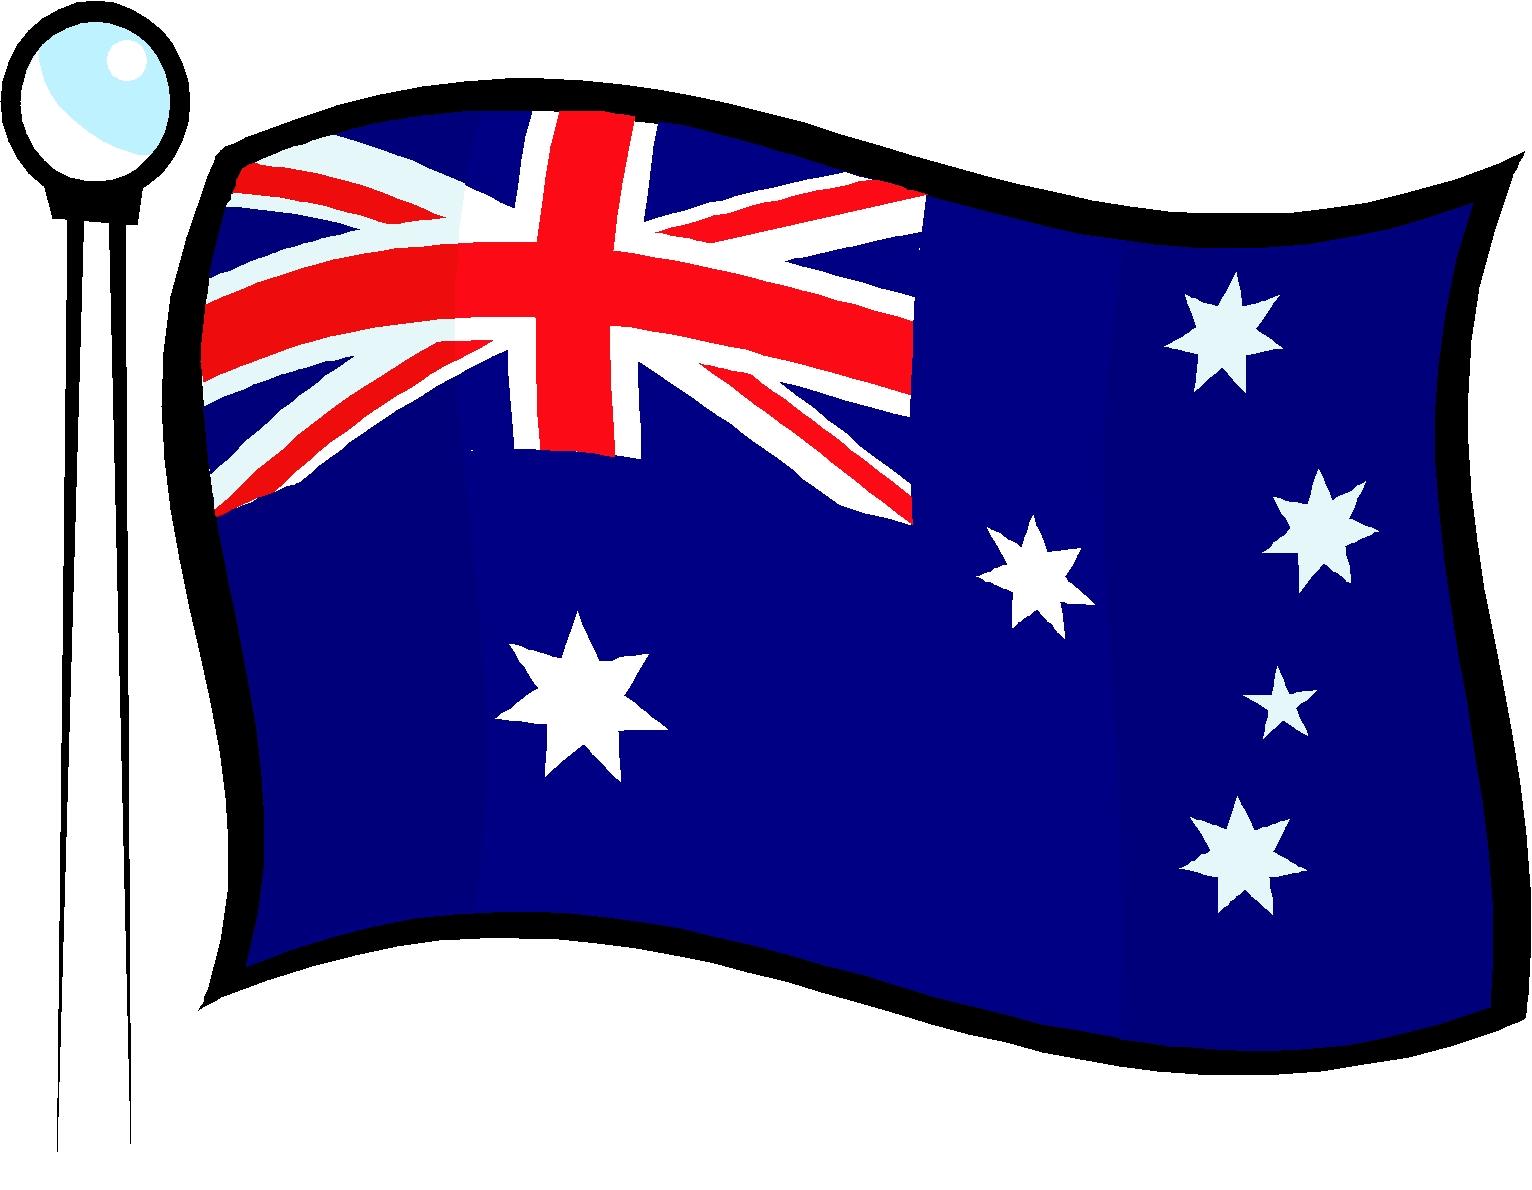 Australia day images clipart svg freeuse Aussies Abroad\'s official Australia Day 2019 – Aussies Abroad Abu Dhabi svg freeuse